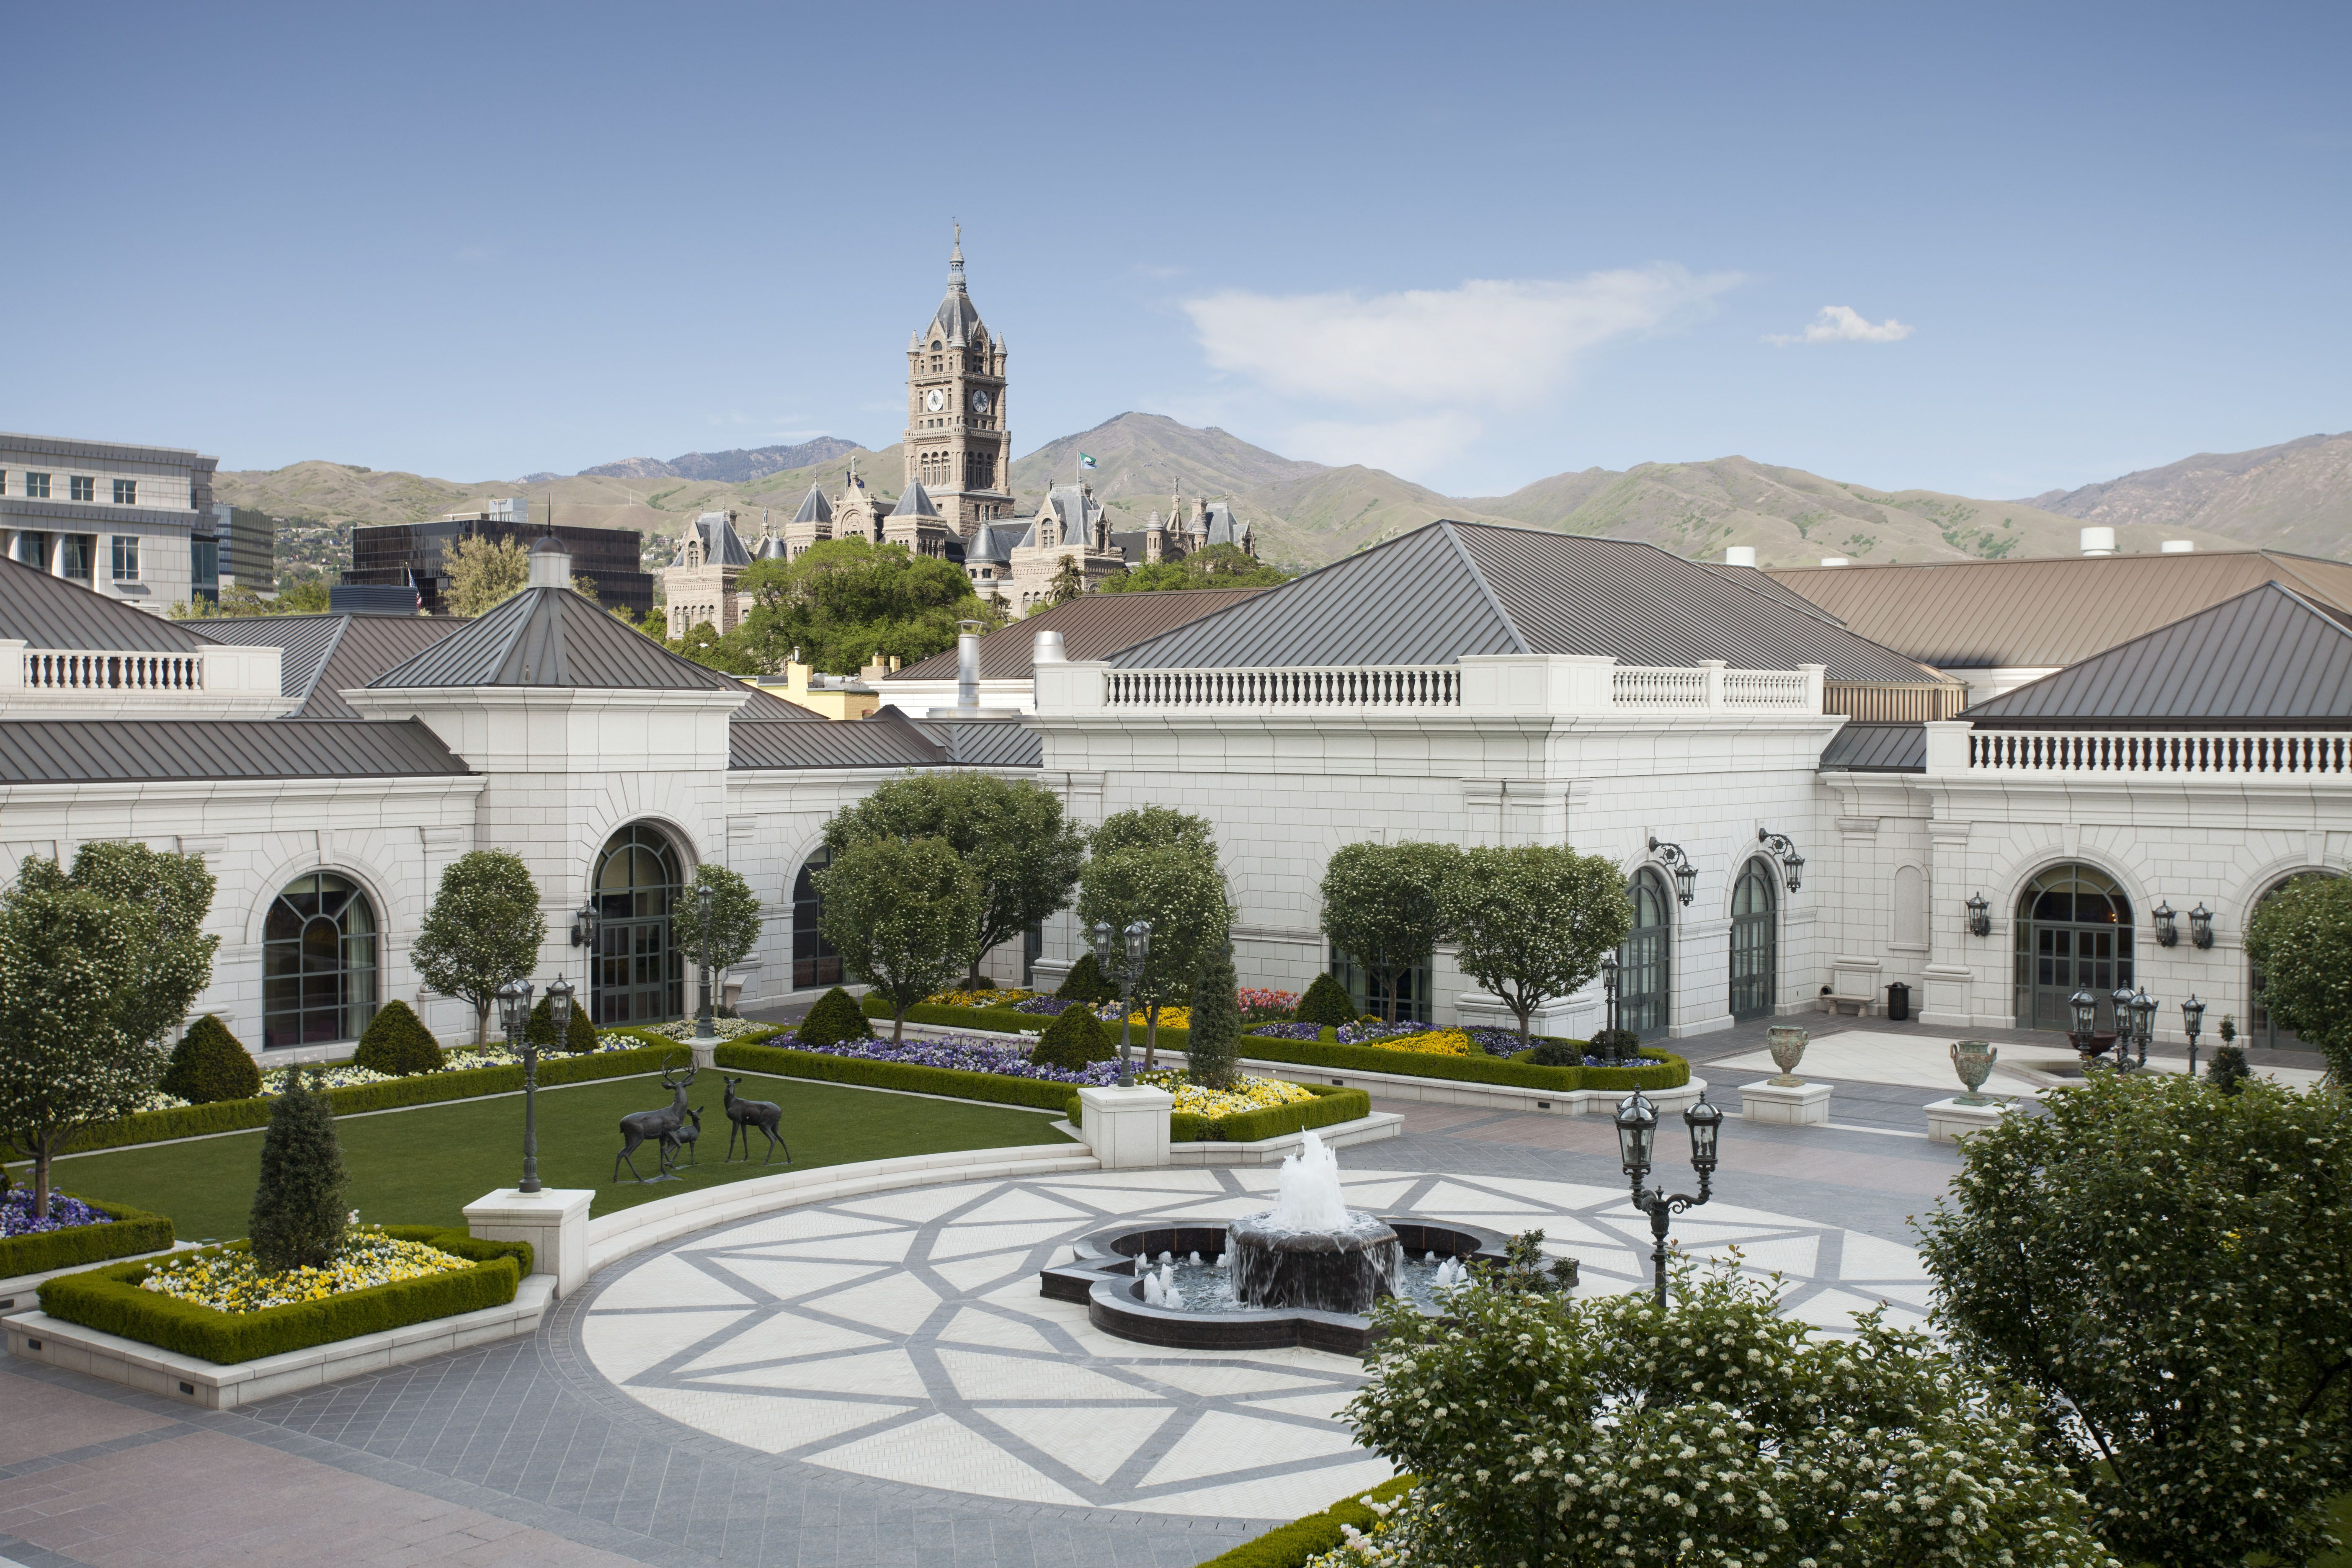 Garden Courtyard at The Grand America Hotel in Salt Lake